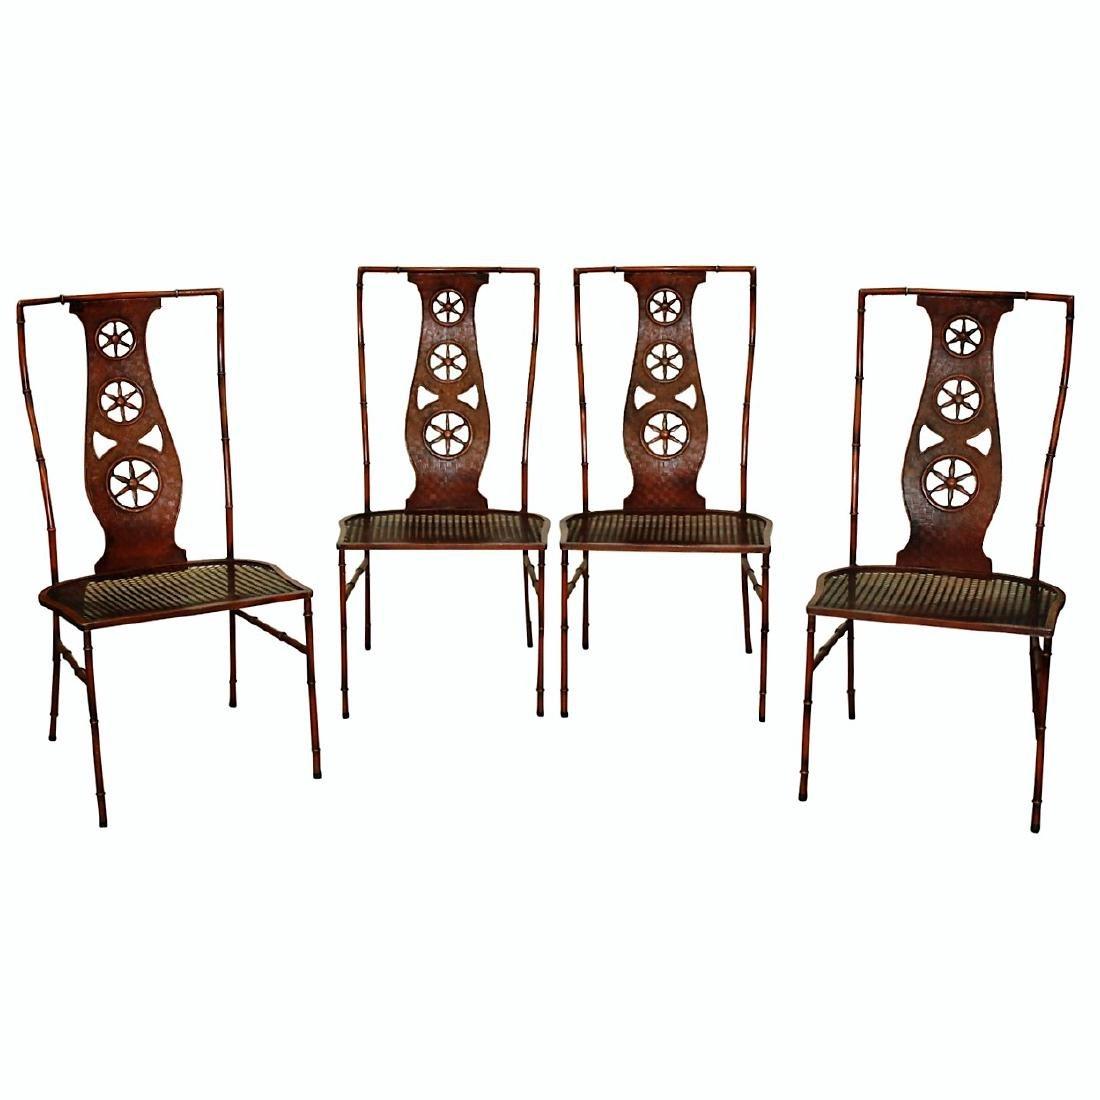 Rare Salterini Chairs - 4 PCS